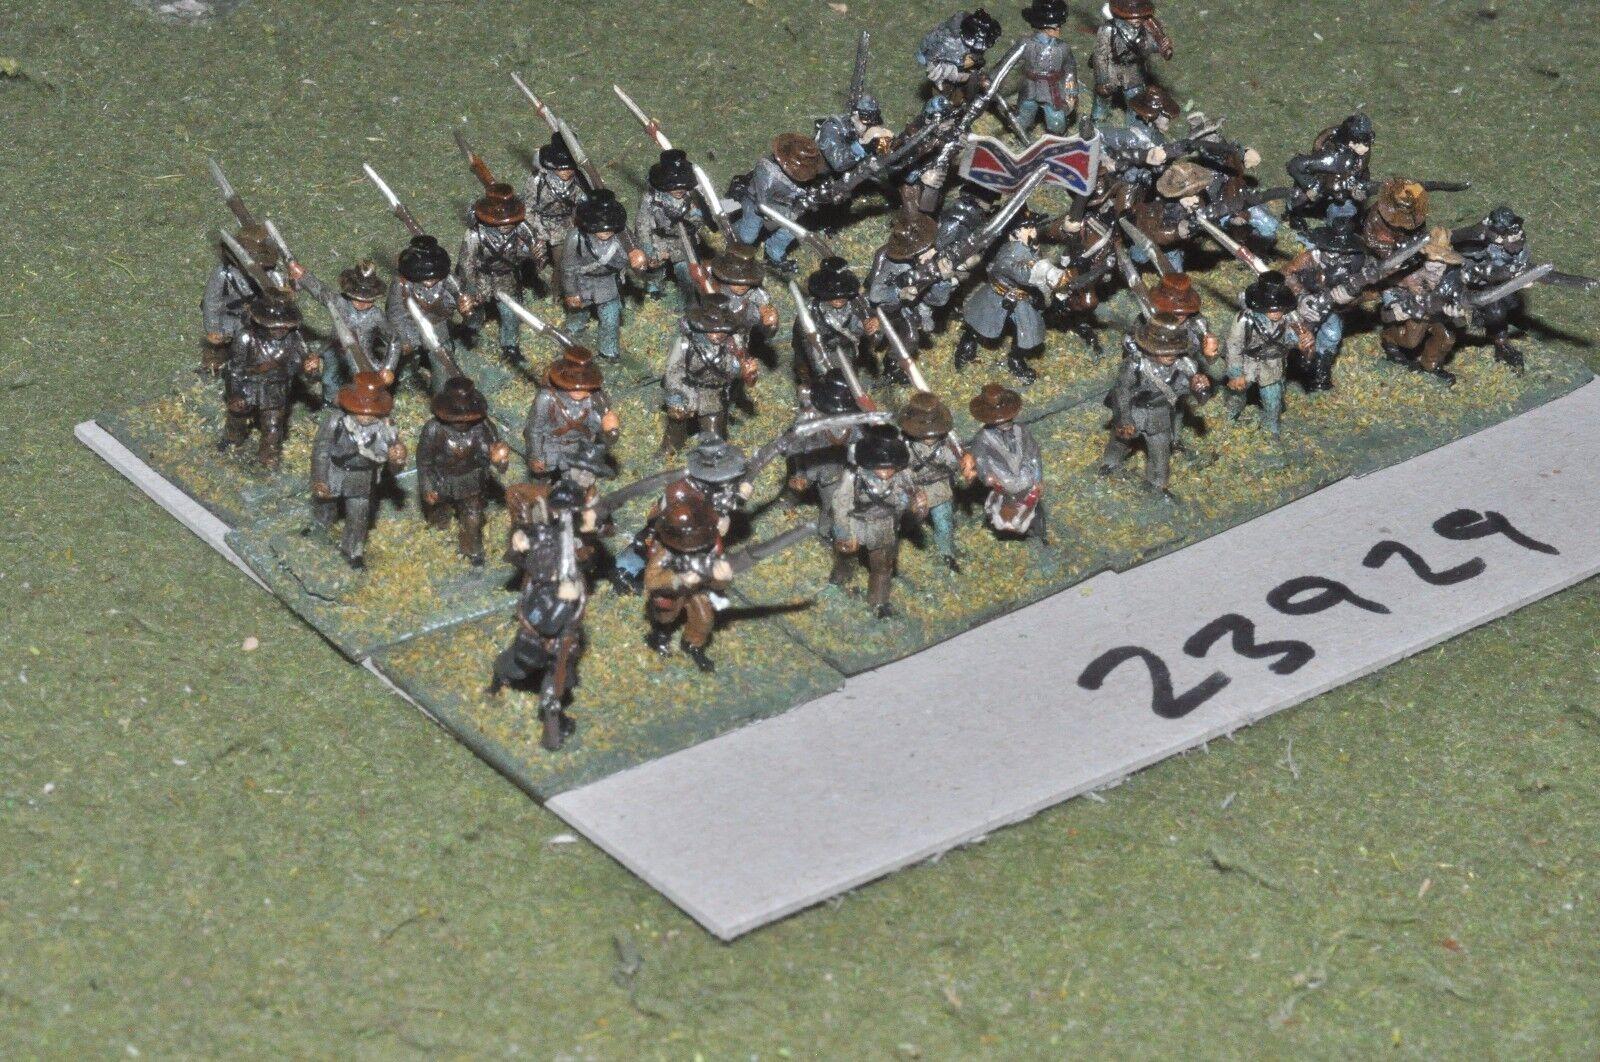 15mm ACW   confederate - regiment 40 figures - inf (23929)